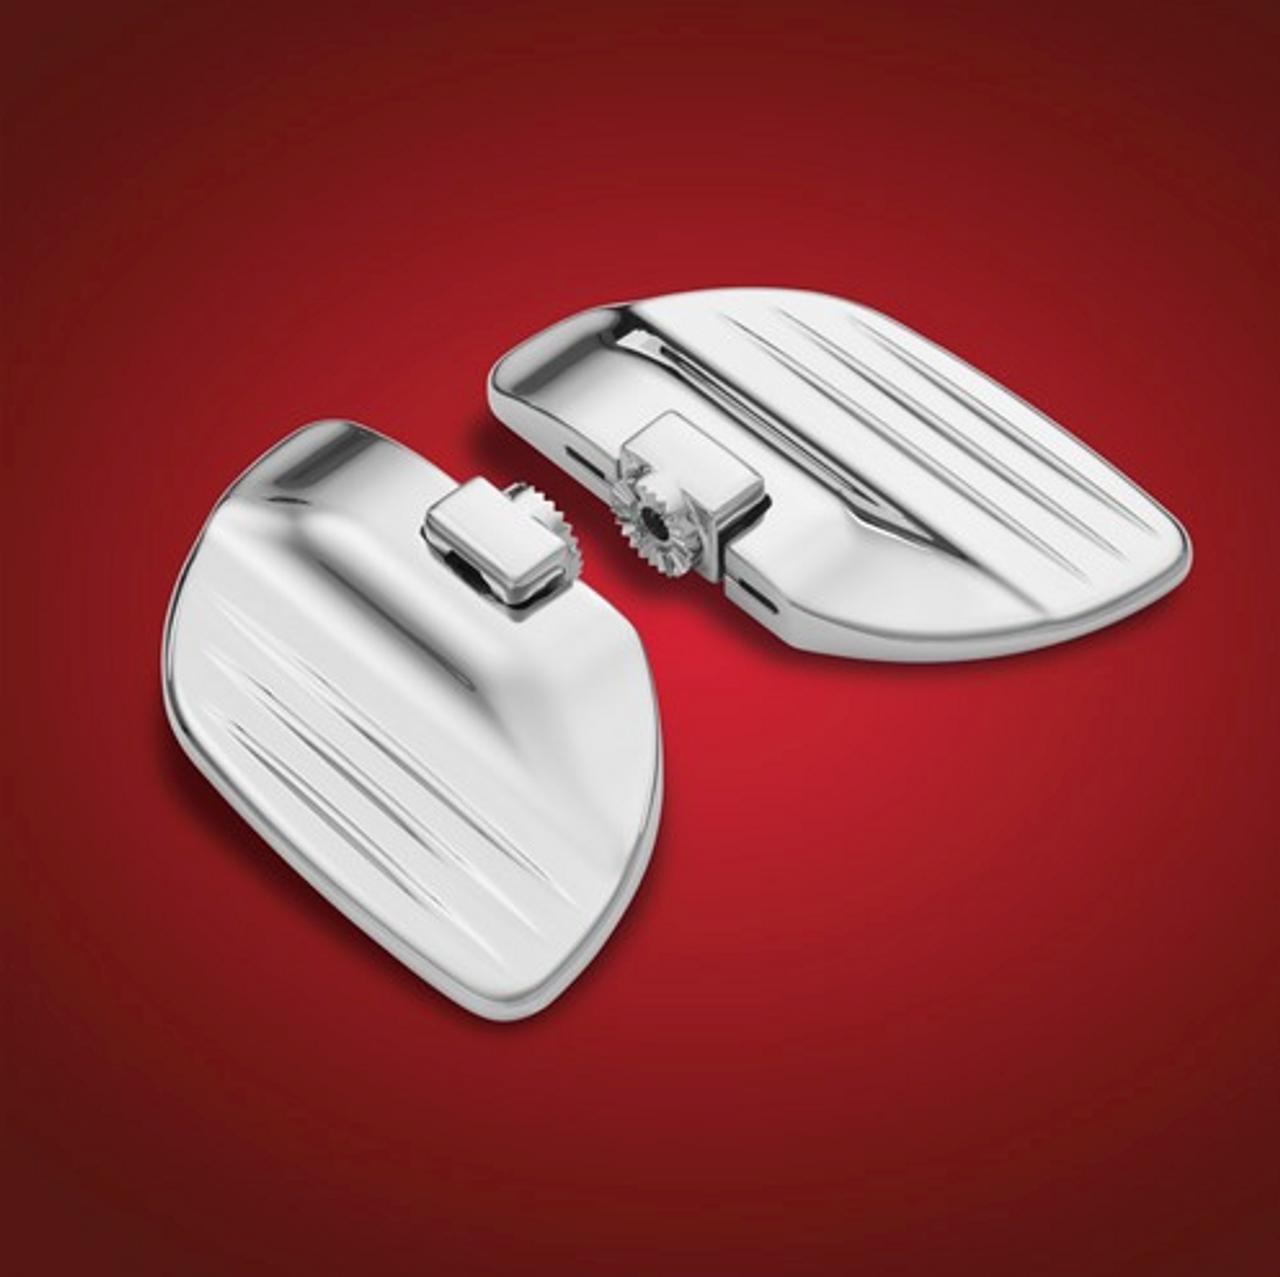 COMMANDER PASSENGER FLOORBOARDS for the CAN AM SPYDER RT (SC-41-185)